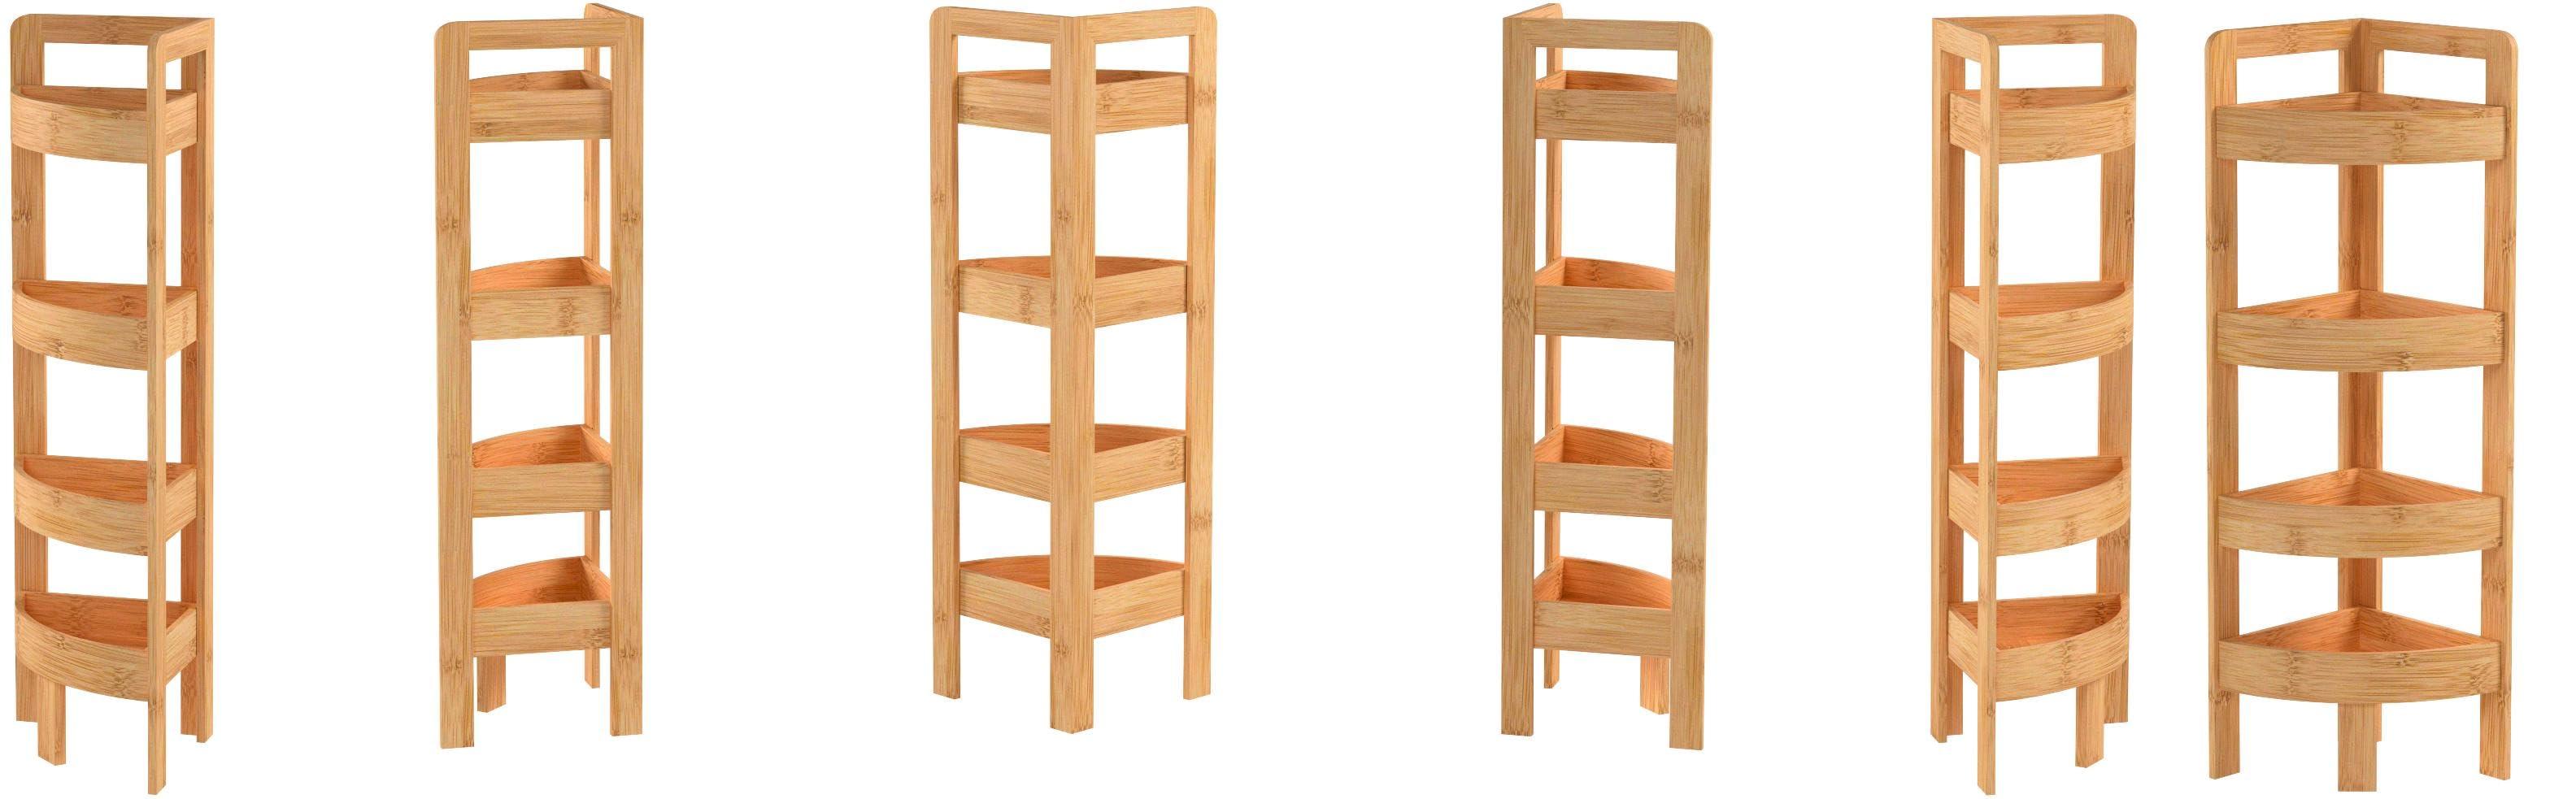 31 5 4 Tier Bamboo Corner Storage Shelf By Trademark Innovations Amazon Co Uk Kitchen Home